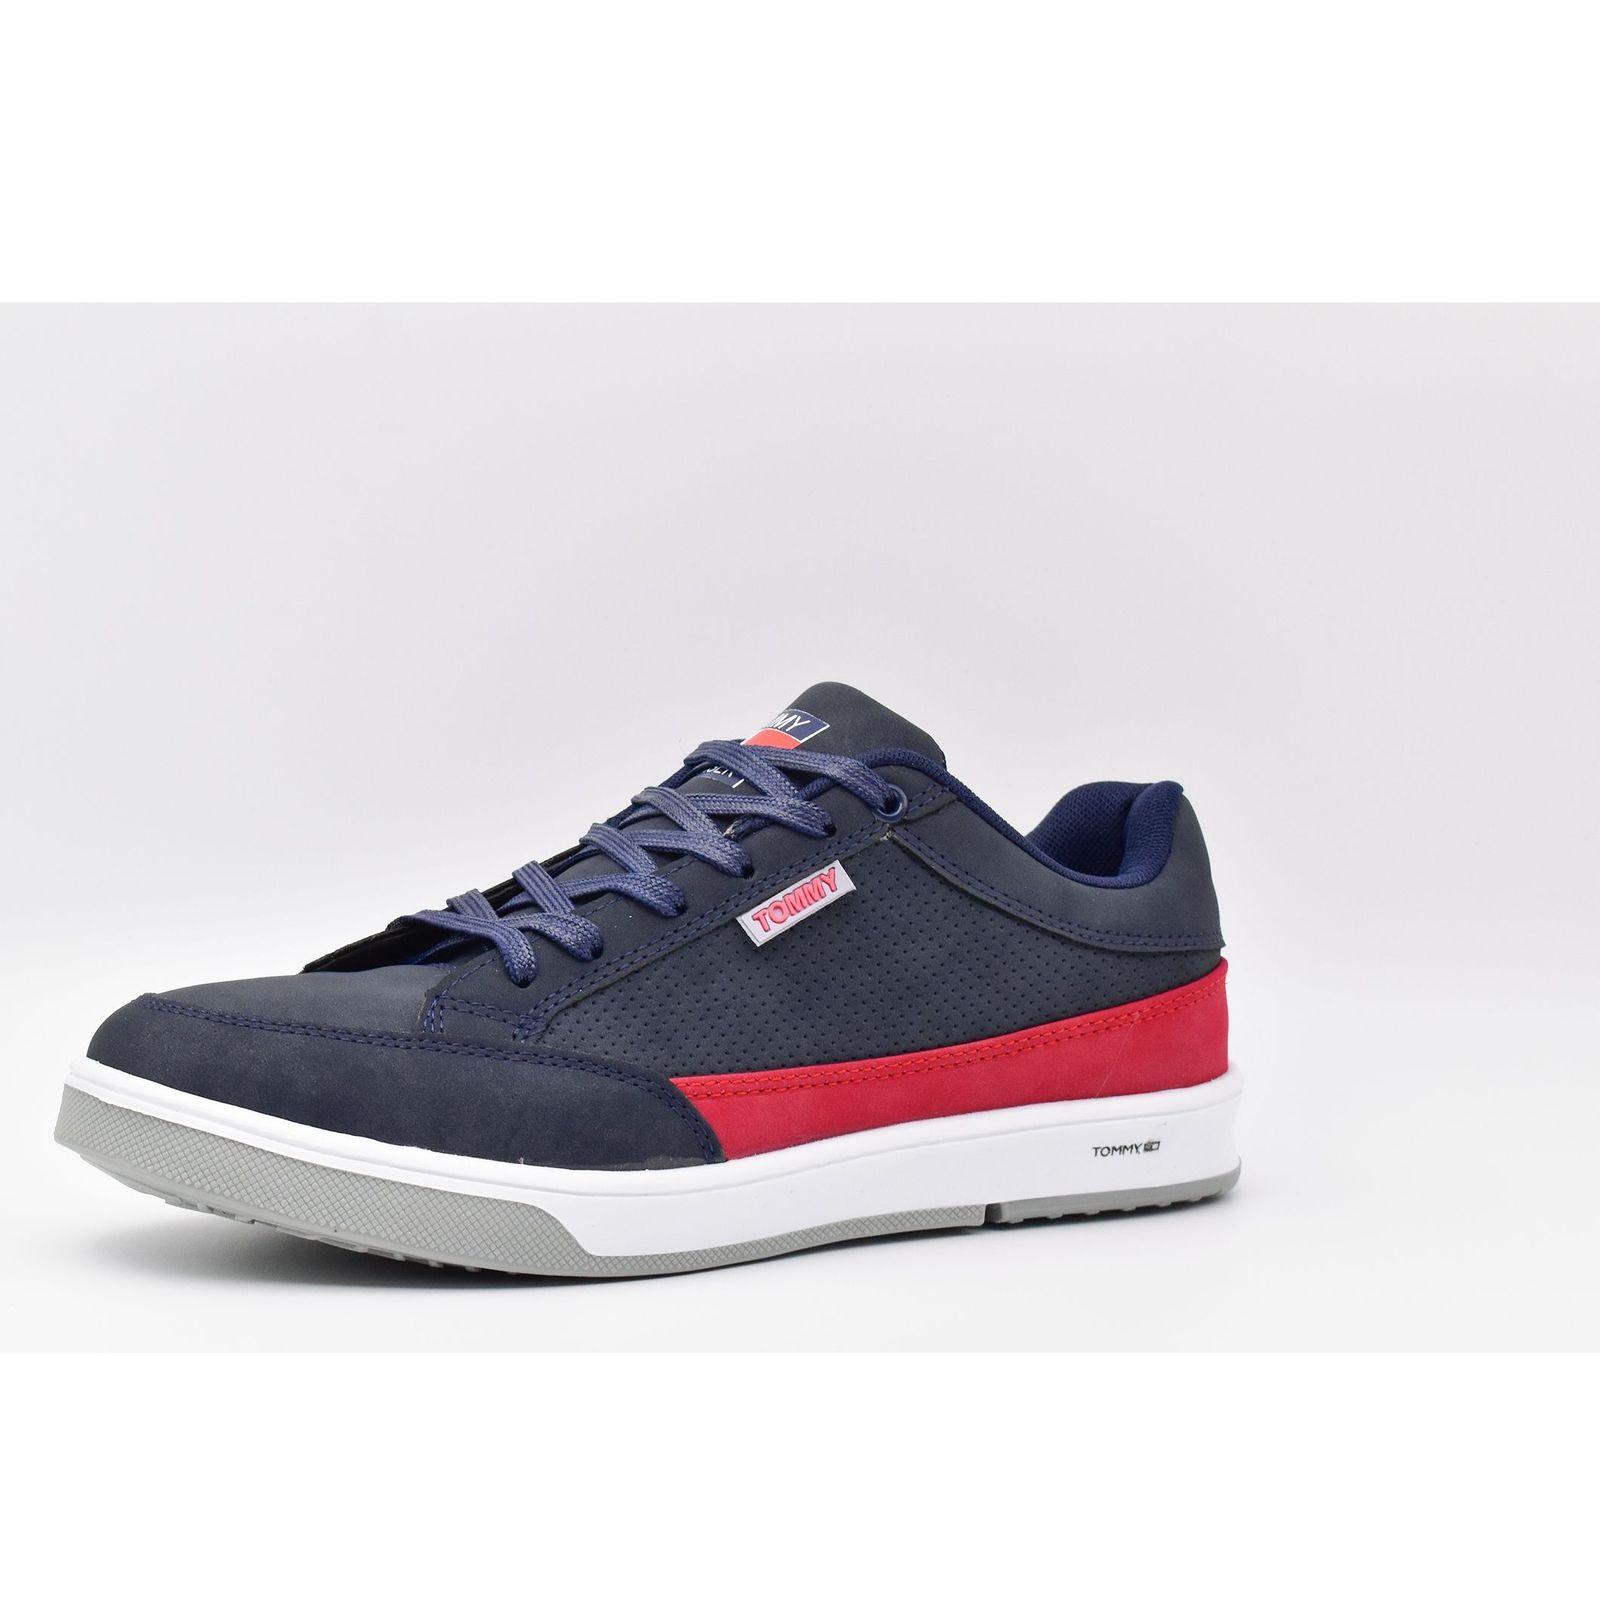 کفش روزمره مردانه مدل رهاورد کد 5513 -  - 8